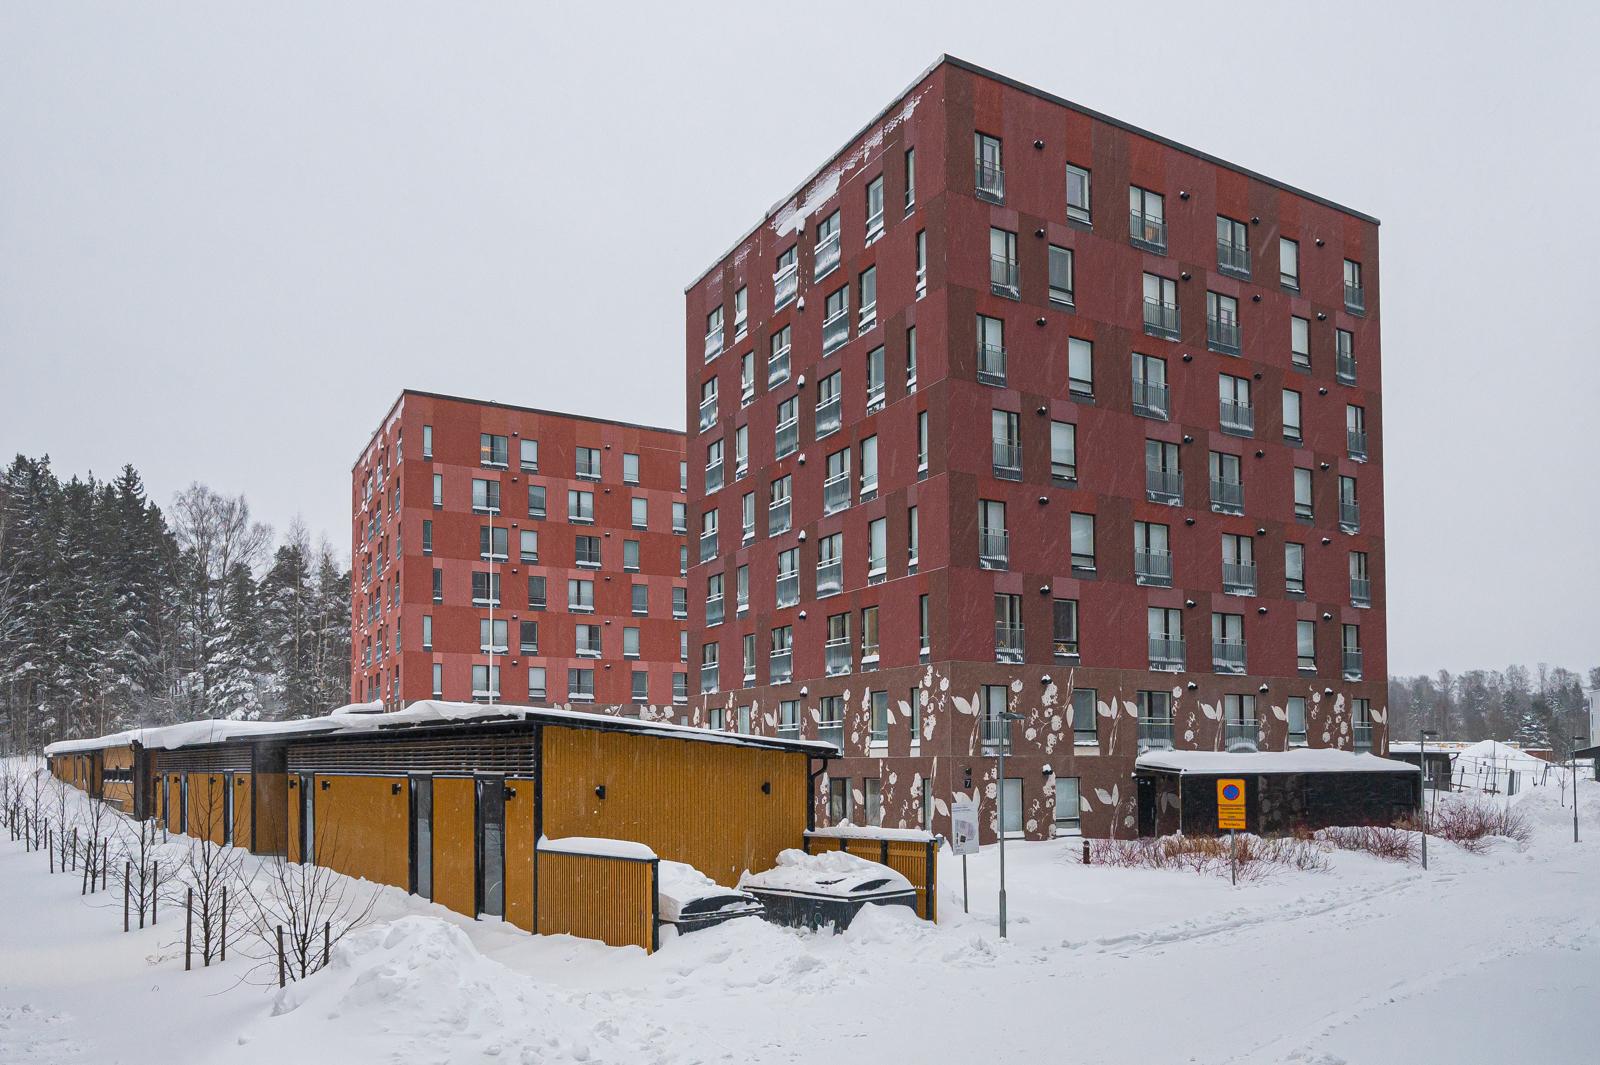 Hakunila, Vantaa